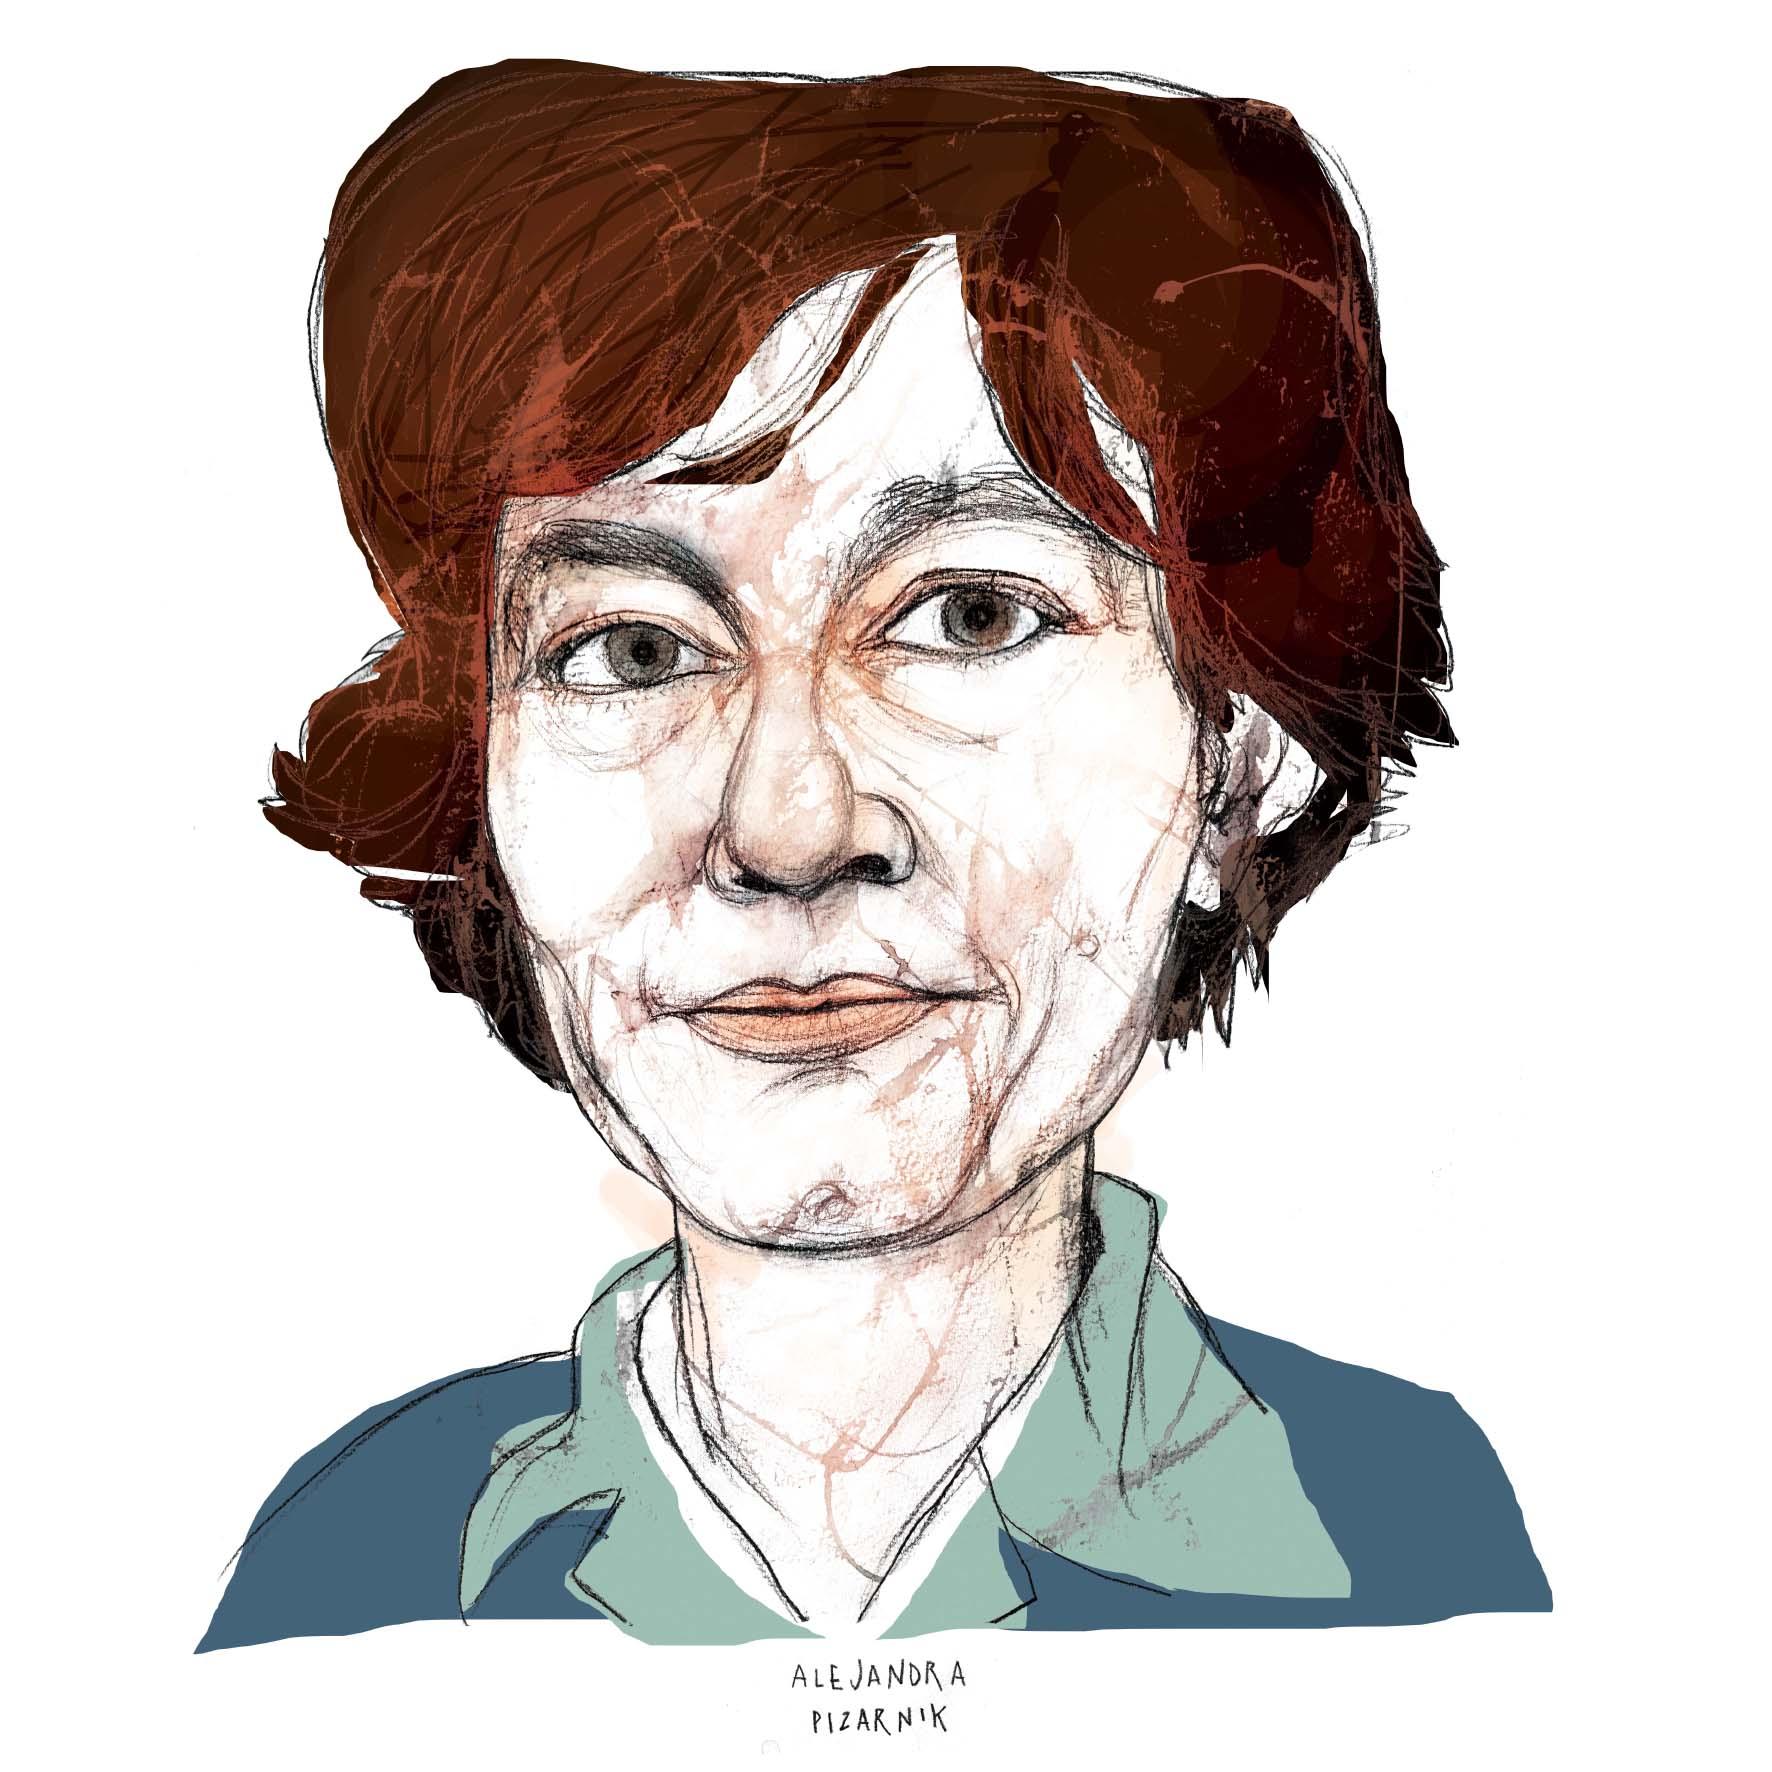 Alejandra Pizarnik cuadrado